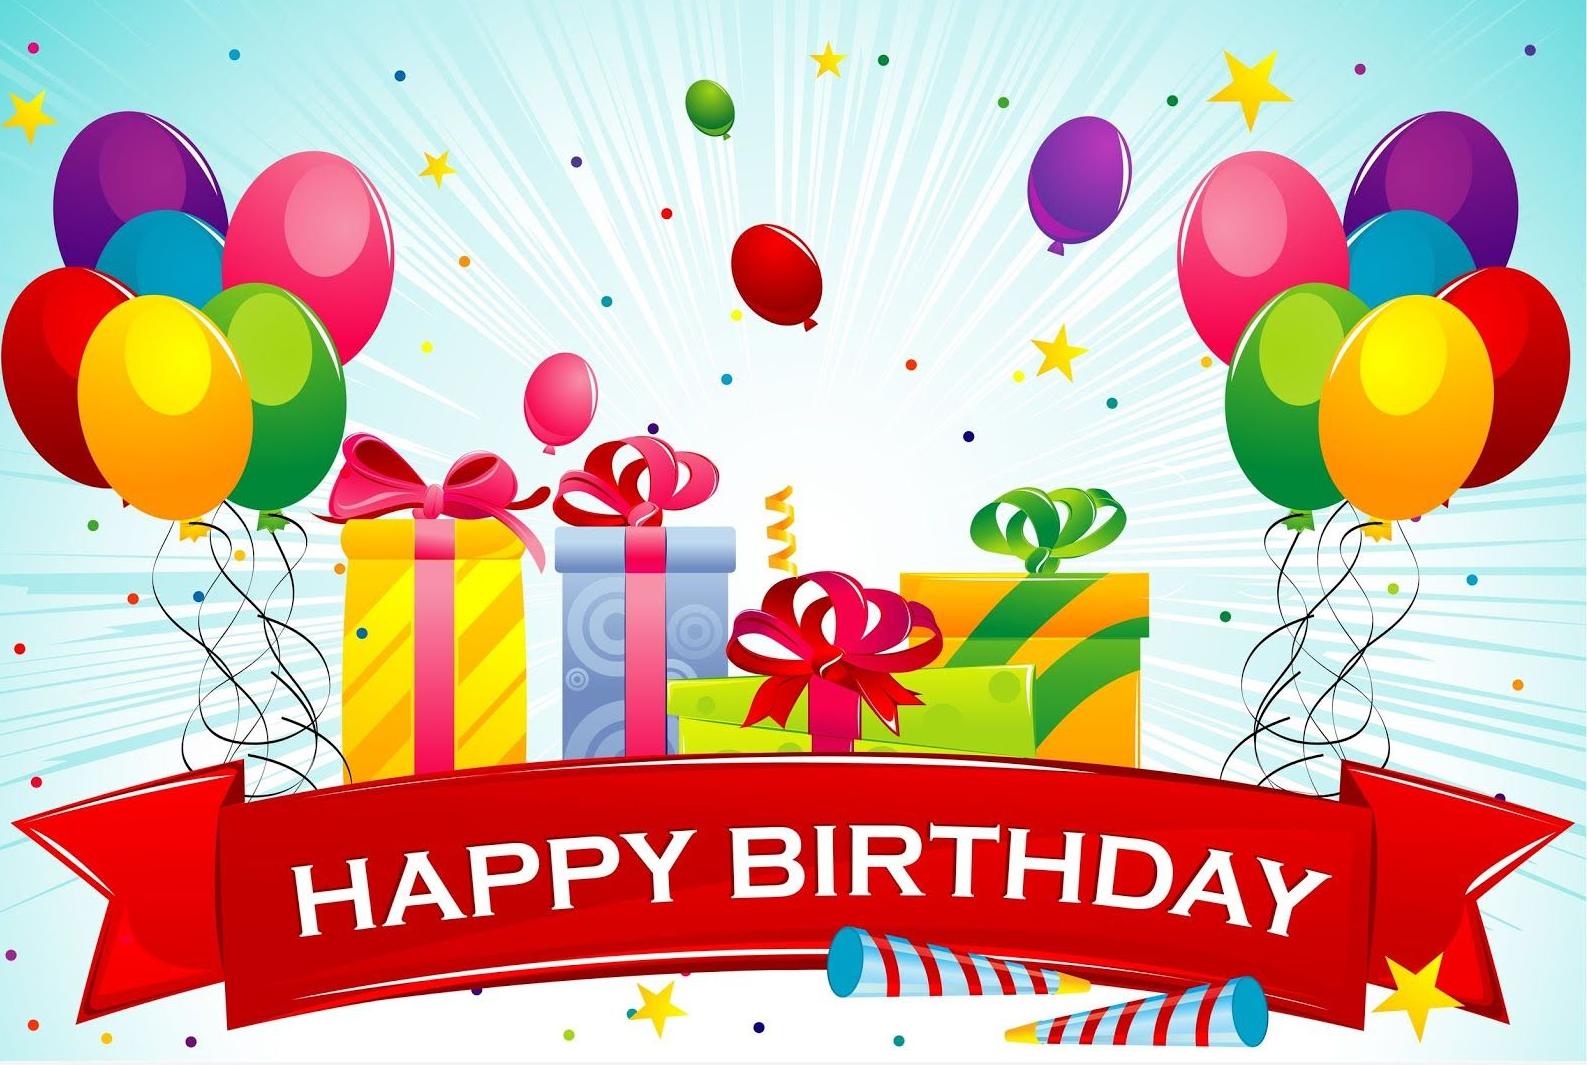 Happy Birthday Wishes ImagesHappy Birthday Cards and Birthday